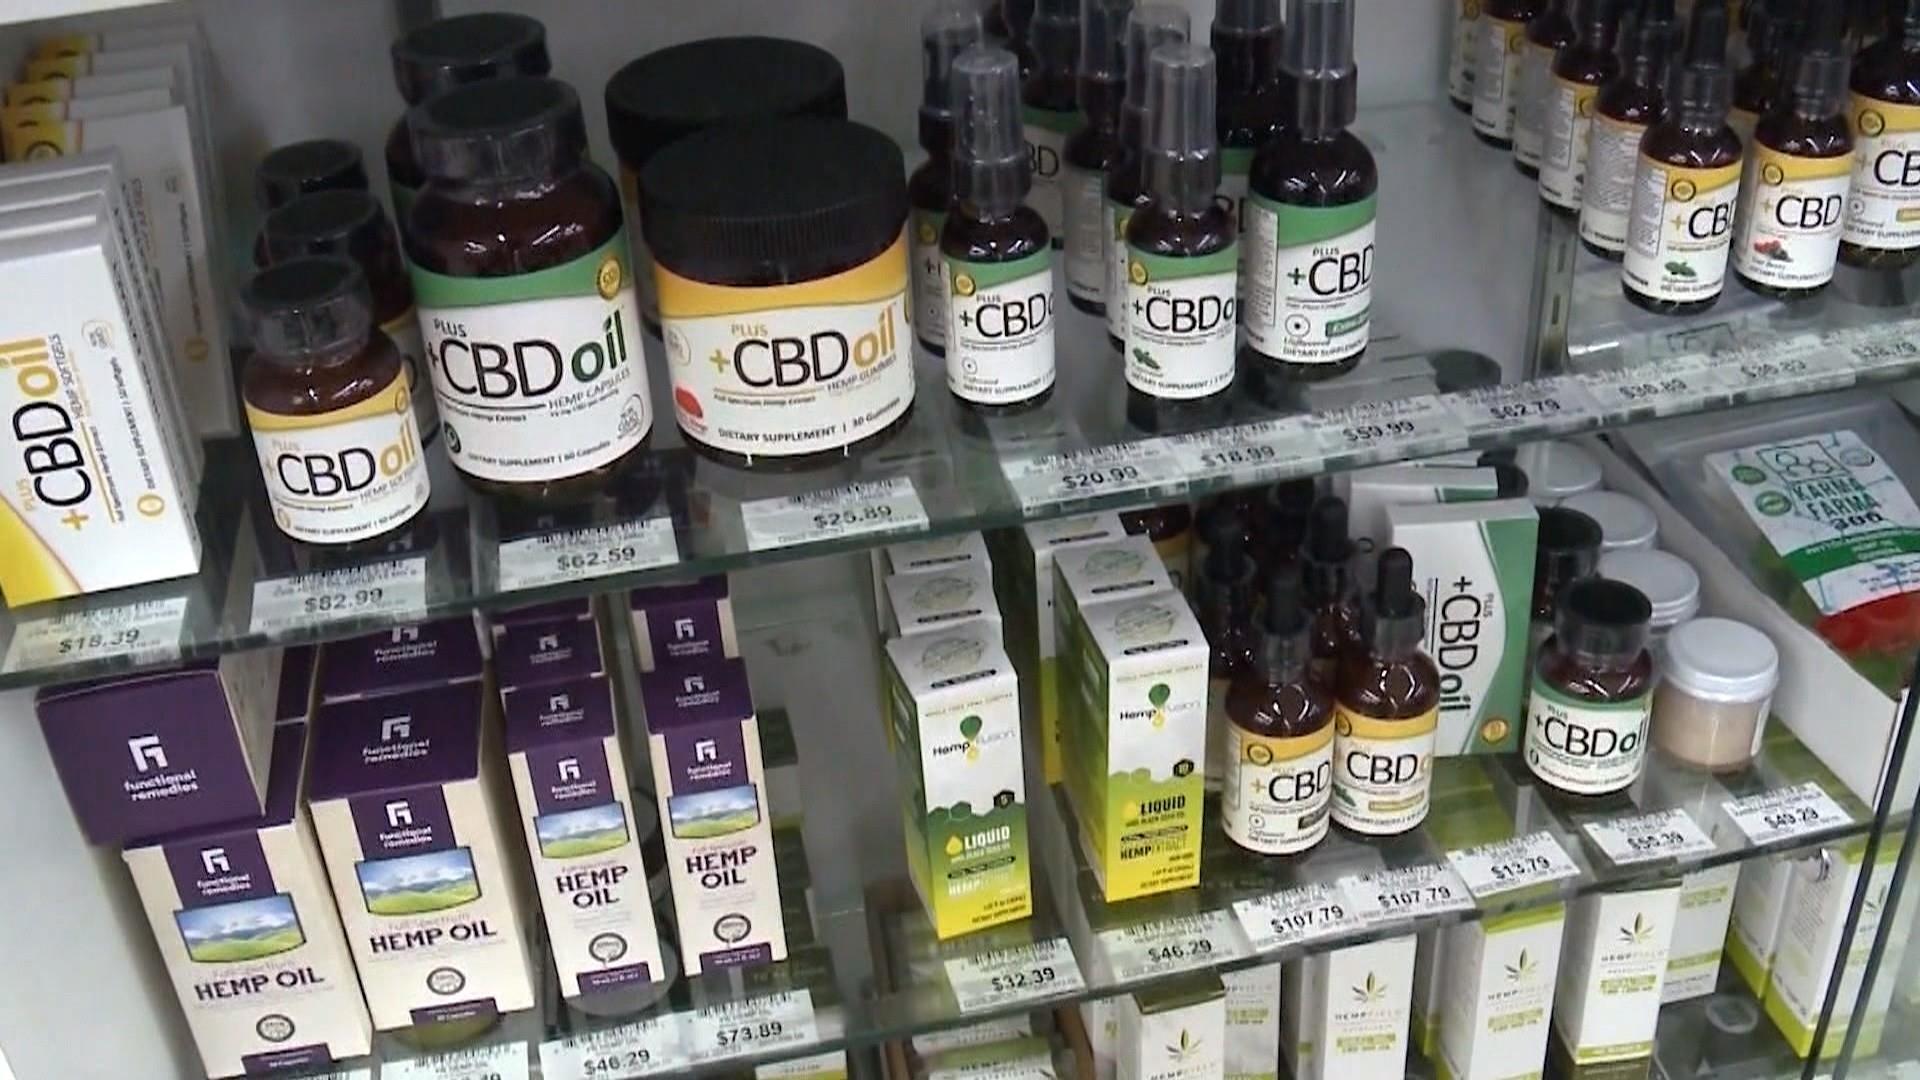 FDA to hold its 1st public hearing on CBD